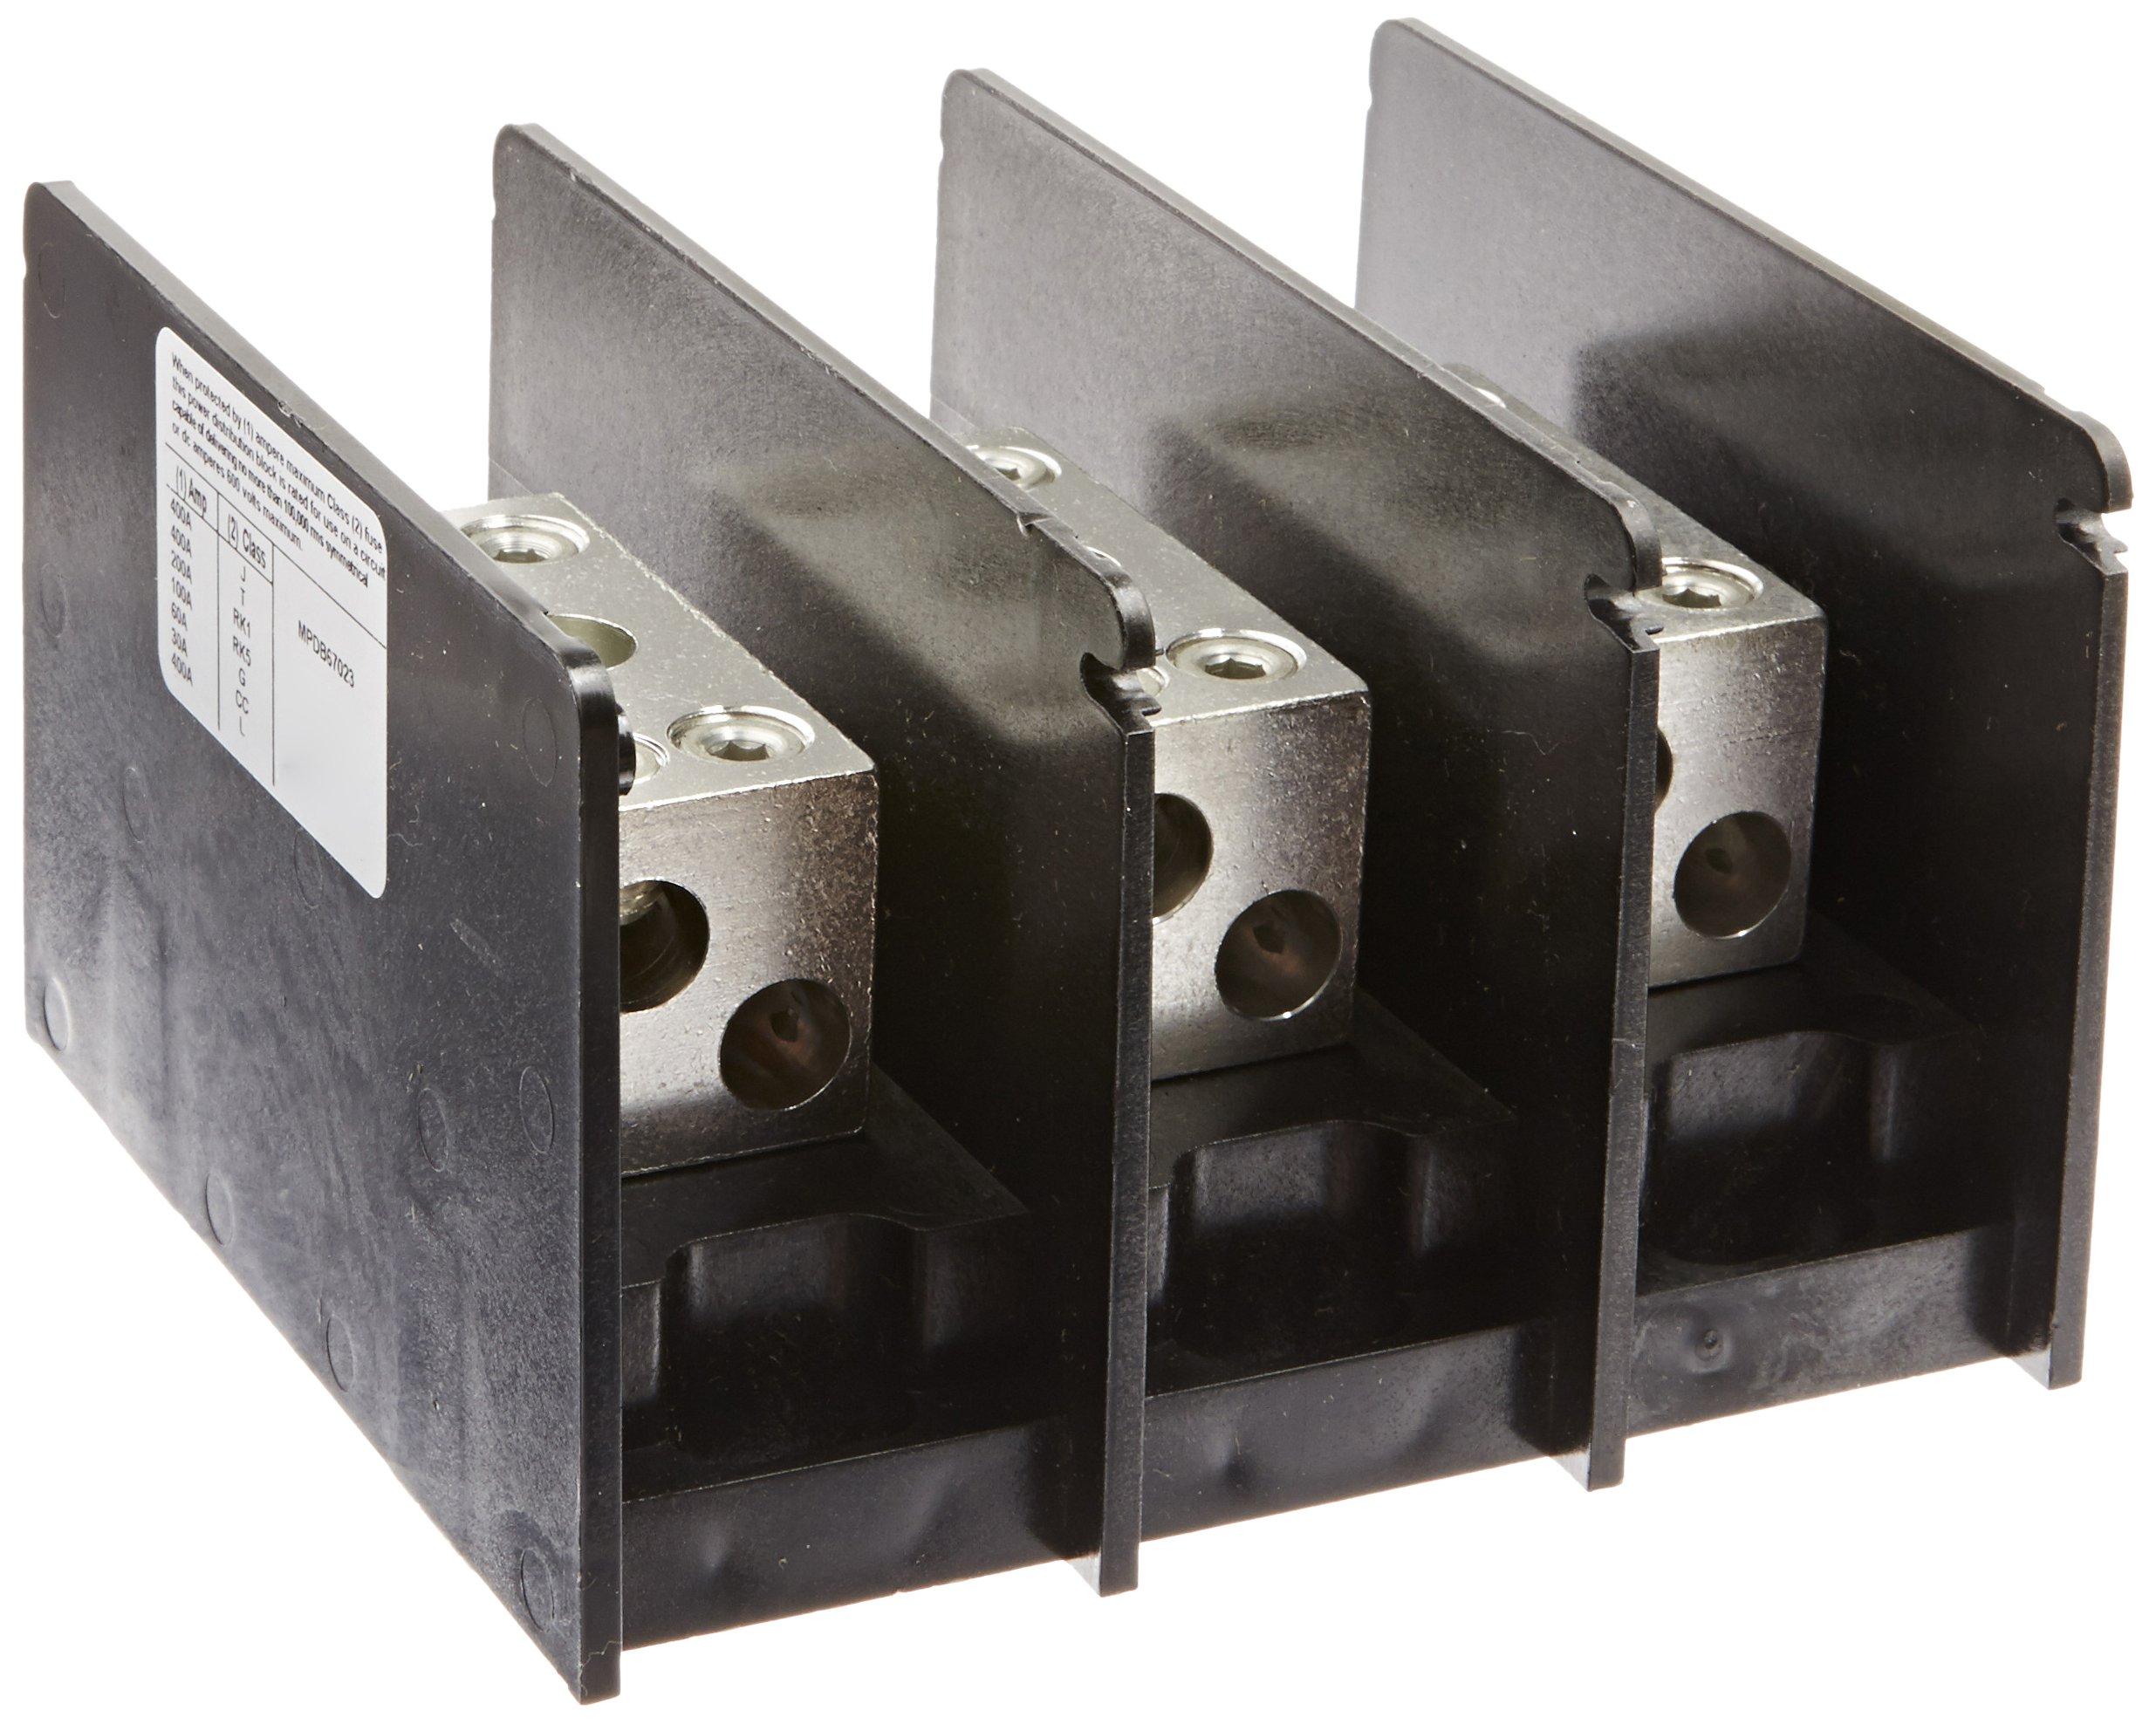 Mersen MPDB67023 Aluminum Intermediate Open Style PDBs, 3-Pole and 2 Stud, 2/0 - 14 Wire Range, 350 Ampere